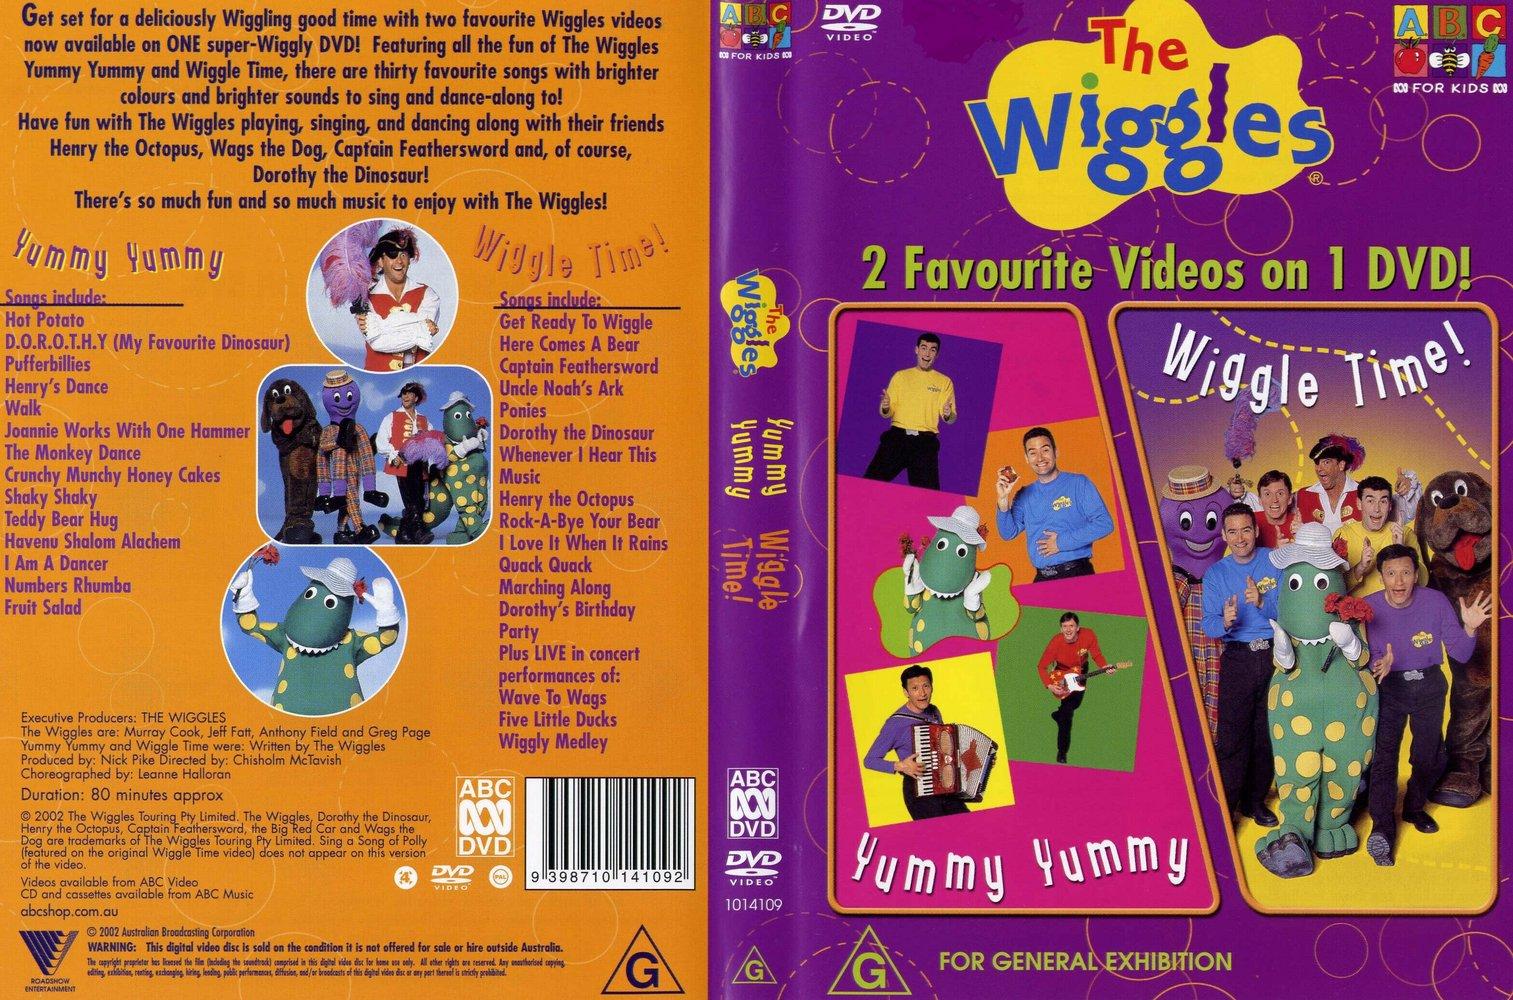 Yummy Yummy + Wiggle Time DVD